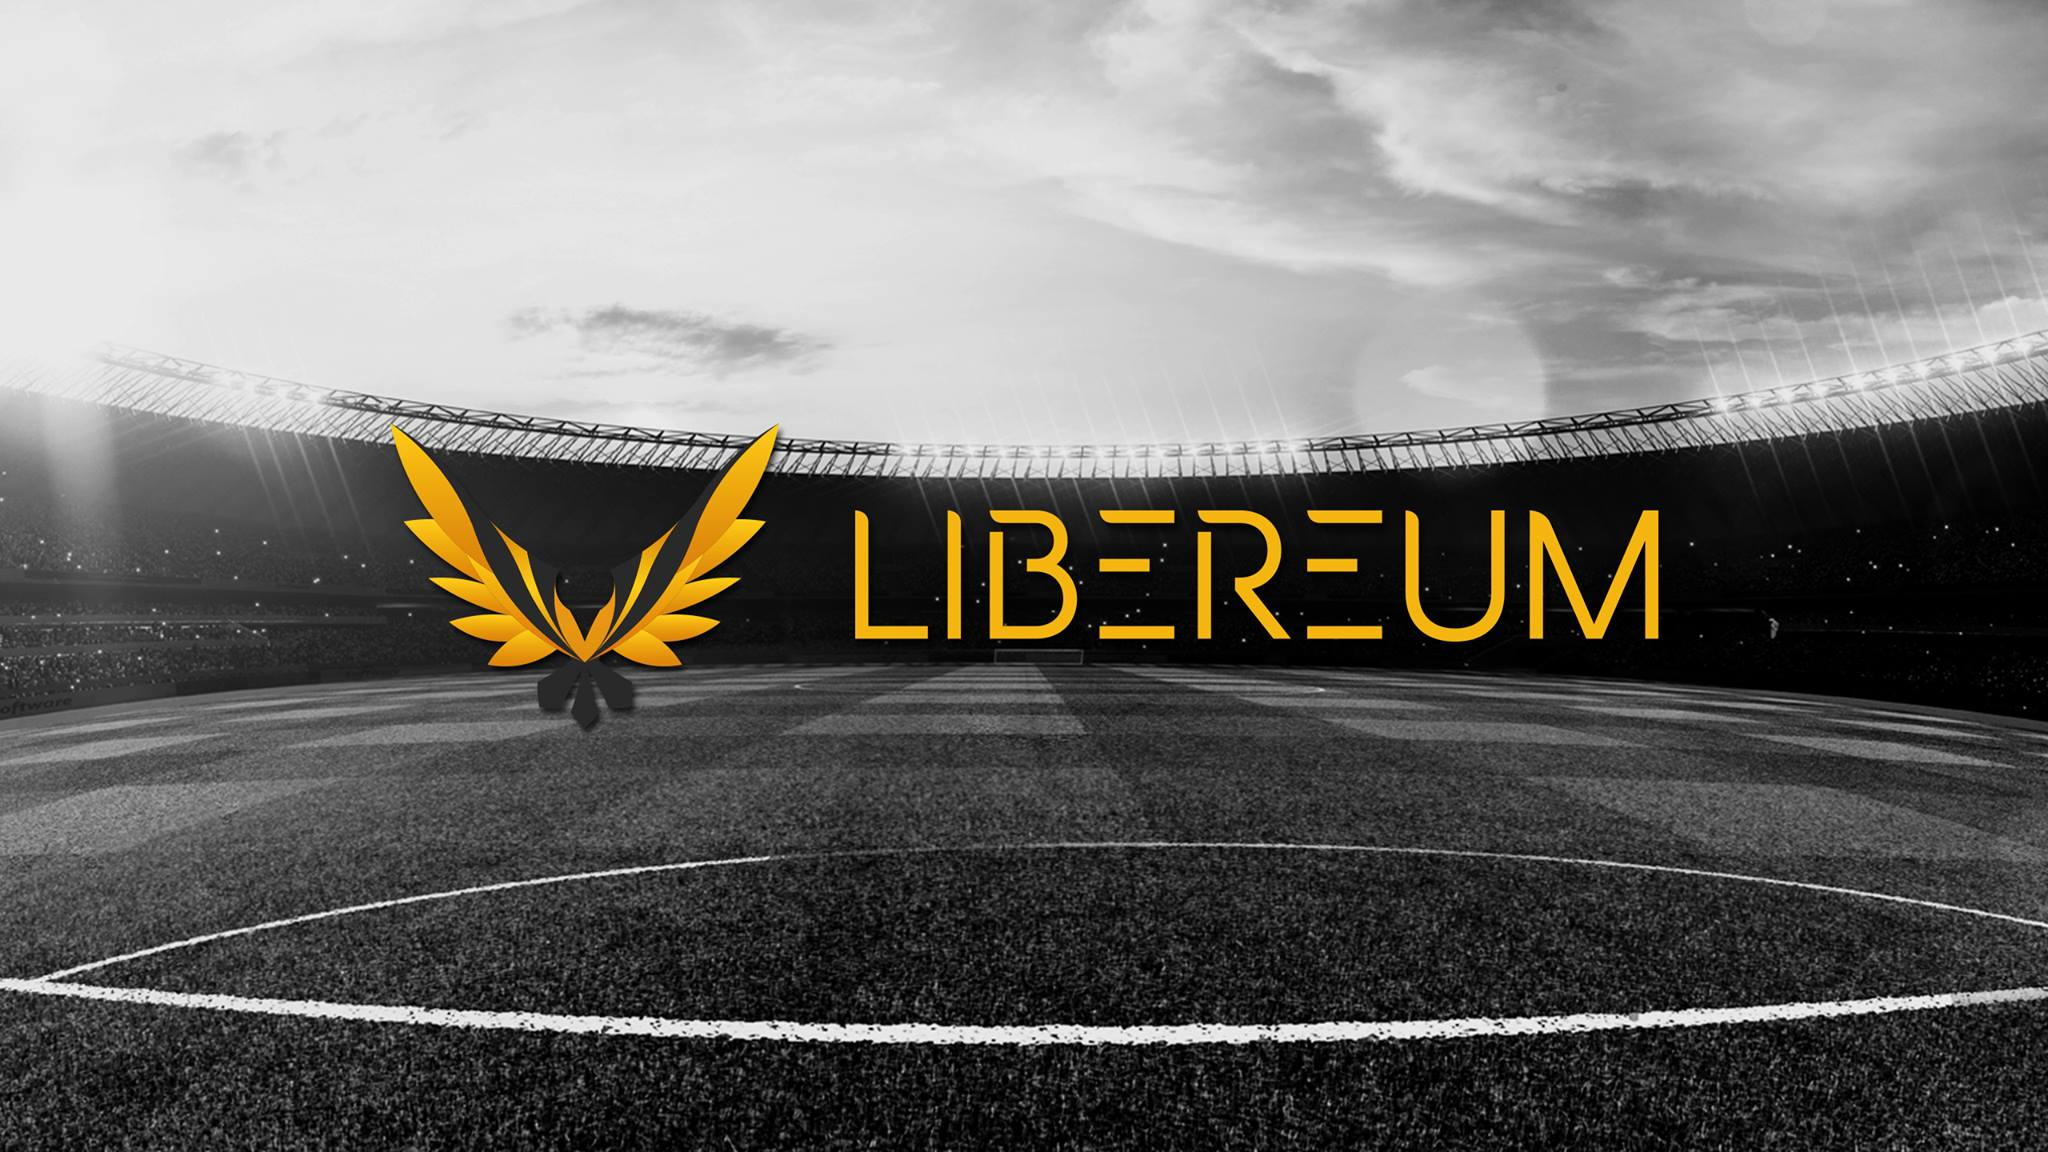 Libereum